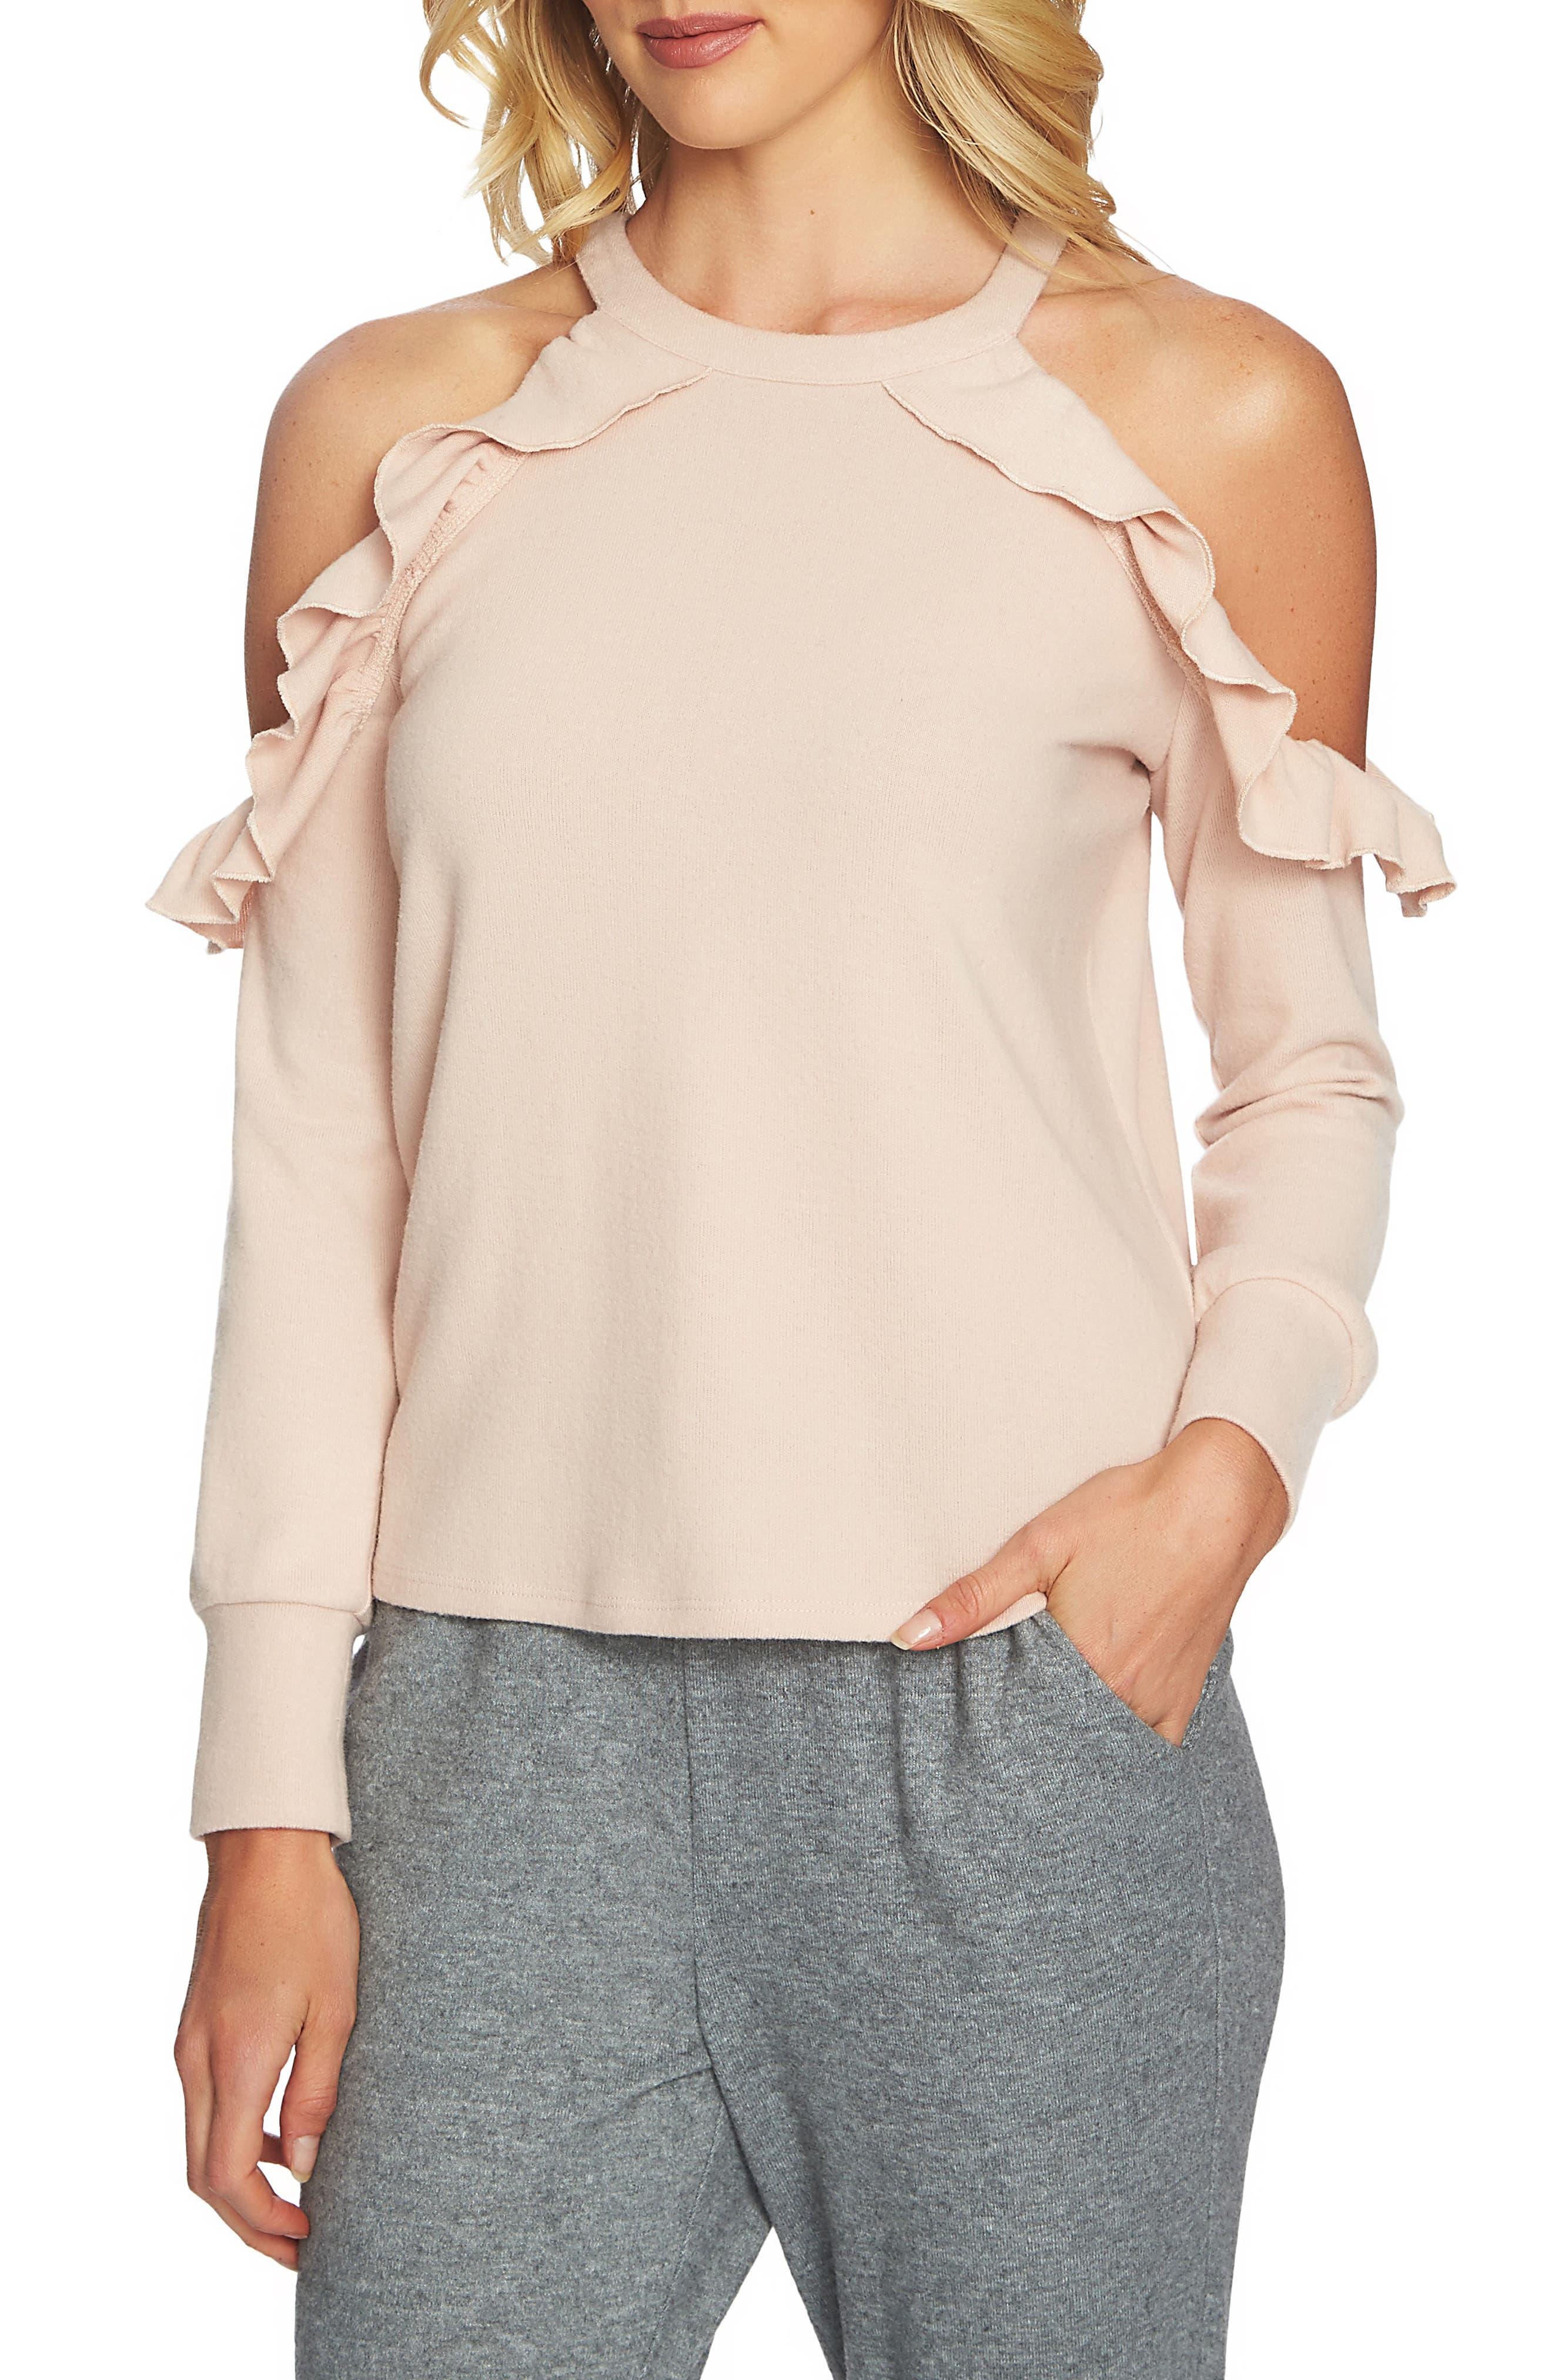 The Cozy Cold Shoulder Knit Top,                         Main,                         color, 897-Blush Frost